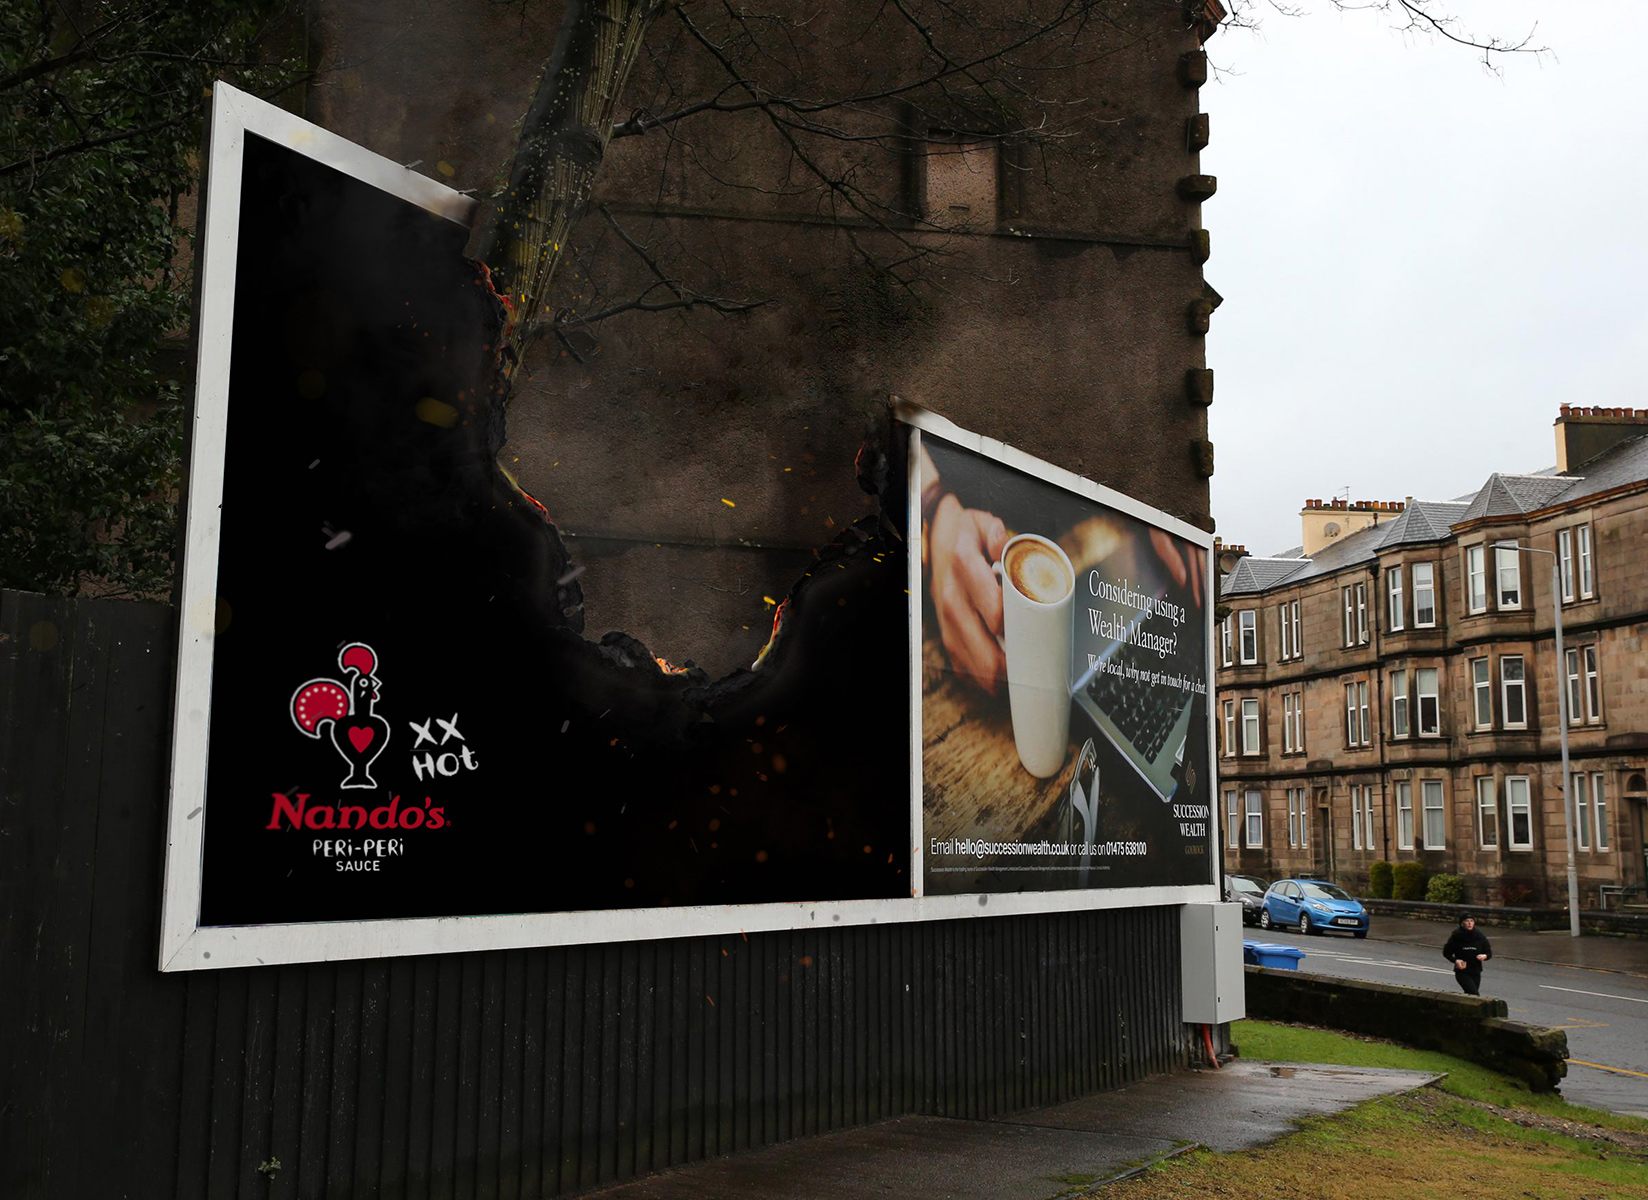 Nando's Per-Peri burning billboard